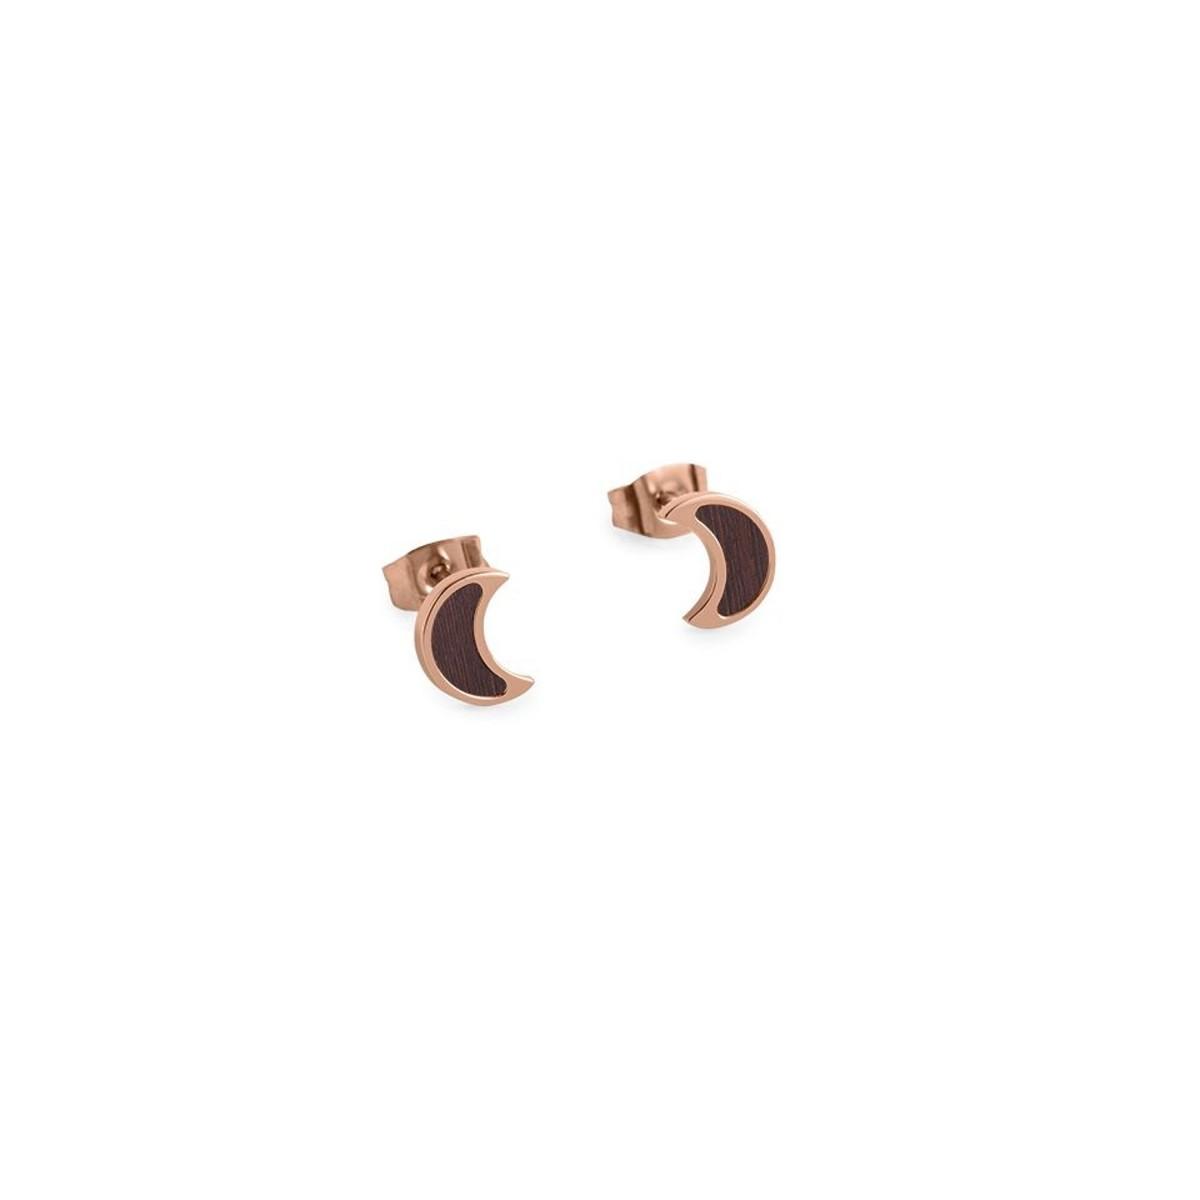 "BeWooden Ohrringe mit Holzdetail - Ohrstecker - Motiv Halbmond - ""Rose Earrings Halfmoon"""